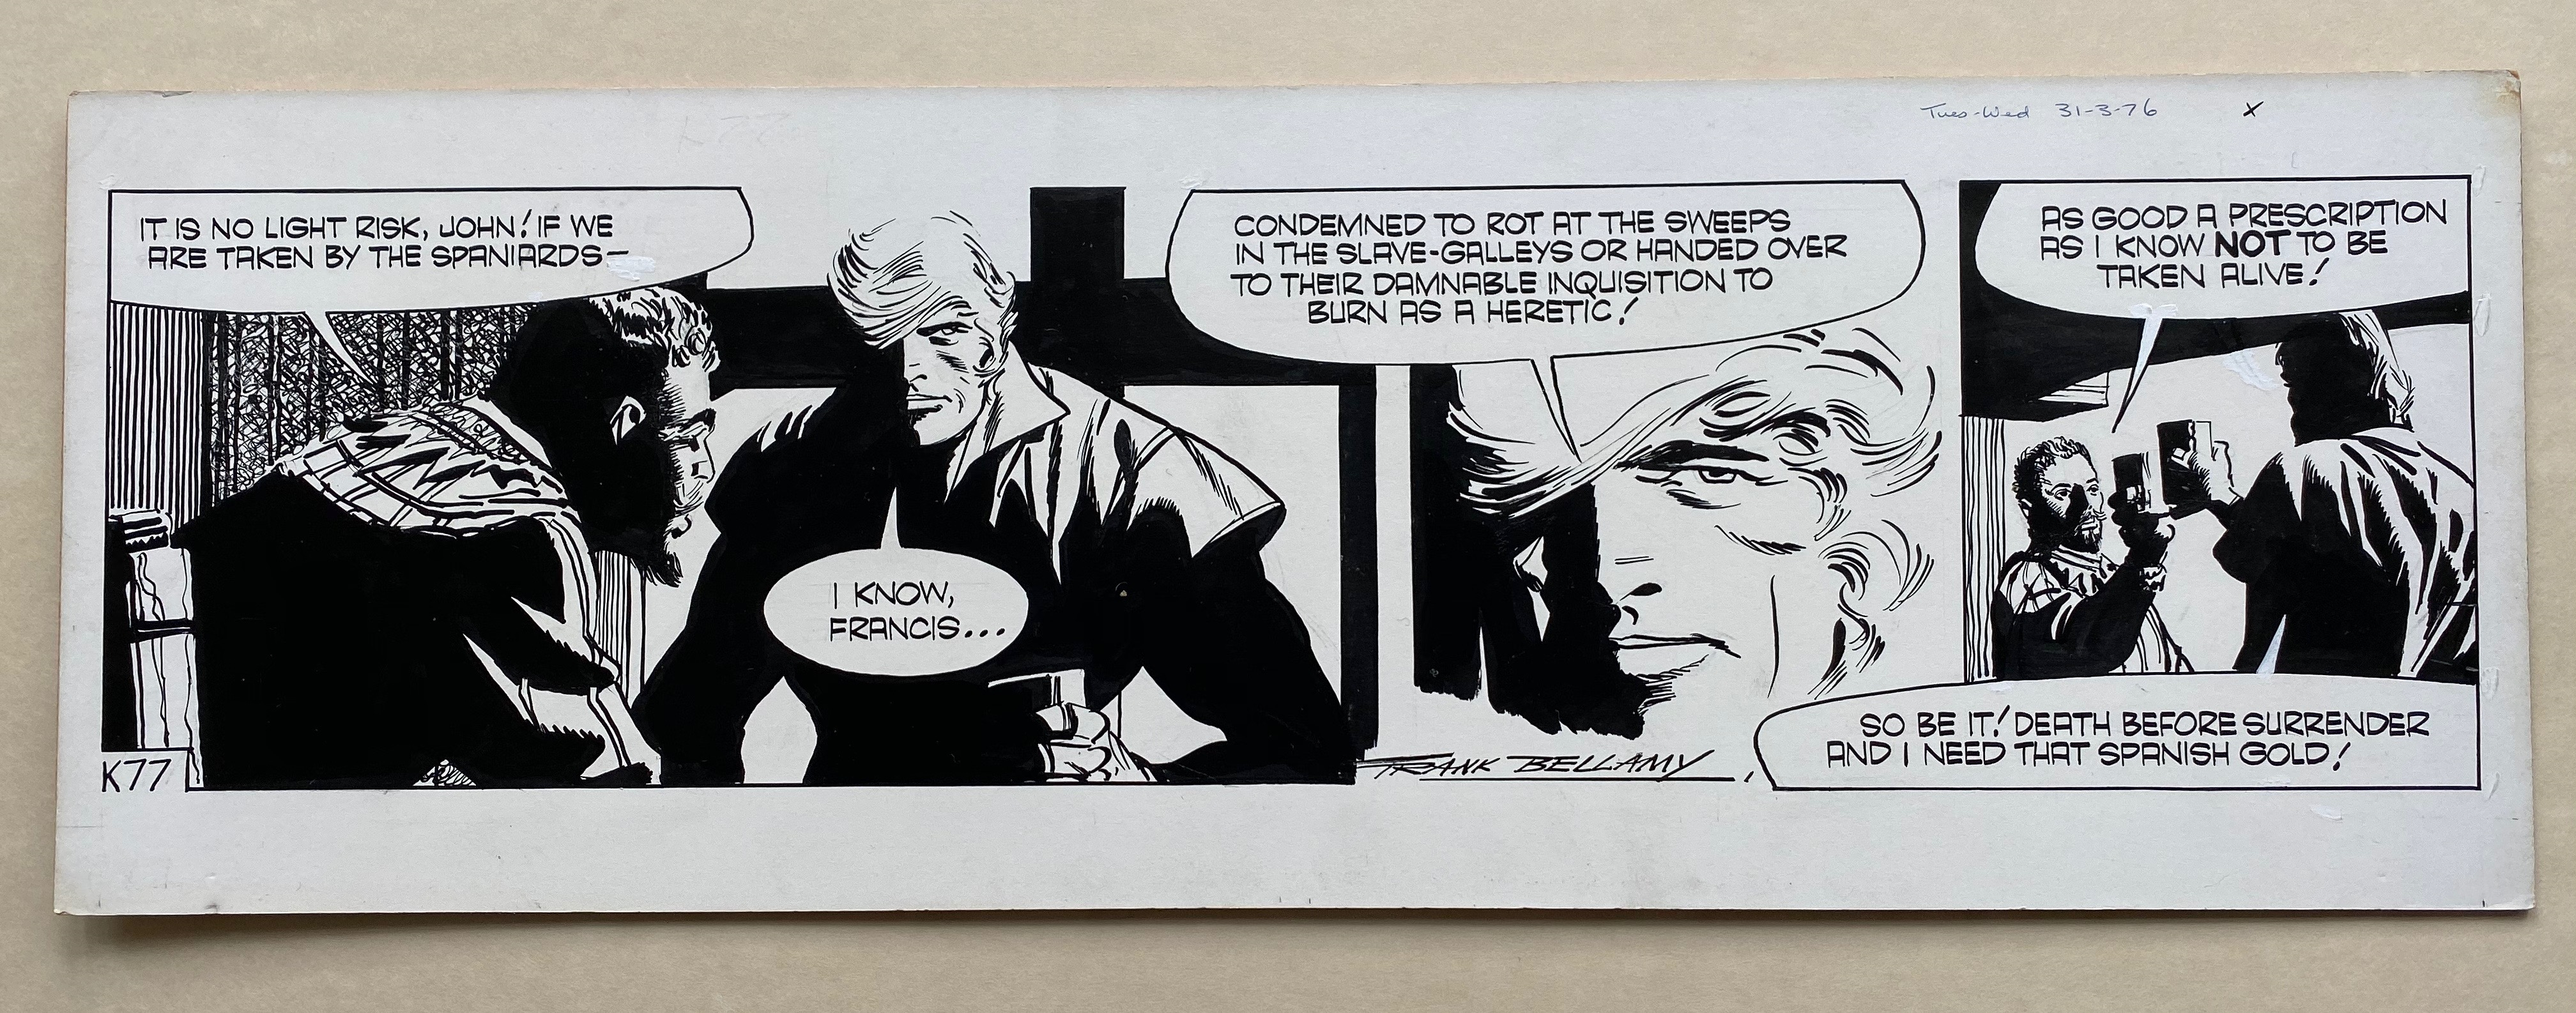 Lot 2143 - GARTH (1976) - ORIGINAL SIGNED FRANK BELLAMY ARTWORK from Daily Mirror - FRANK BELLAMY (Artist) -